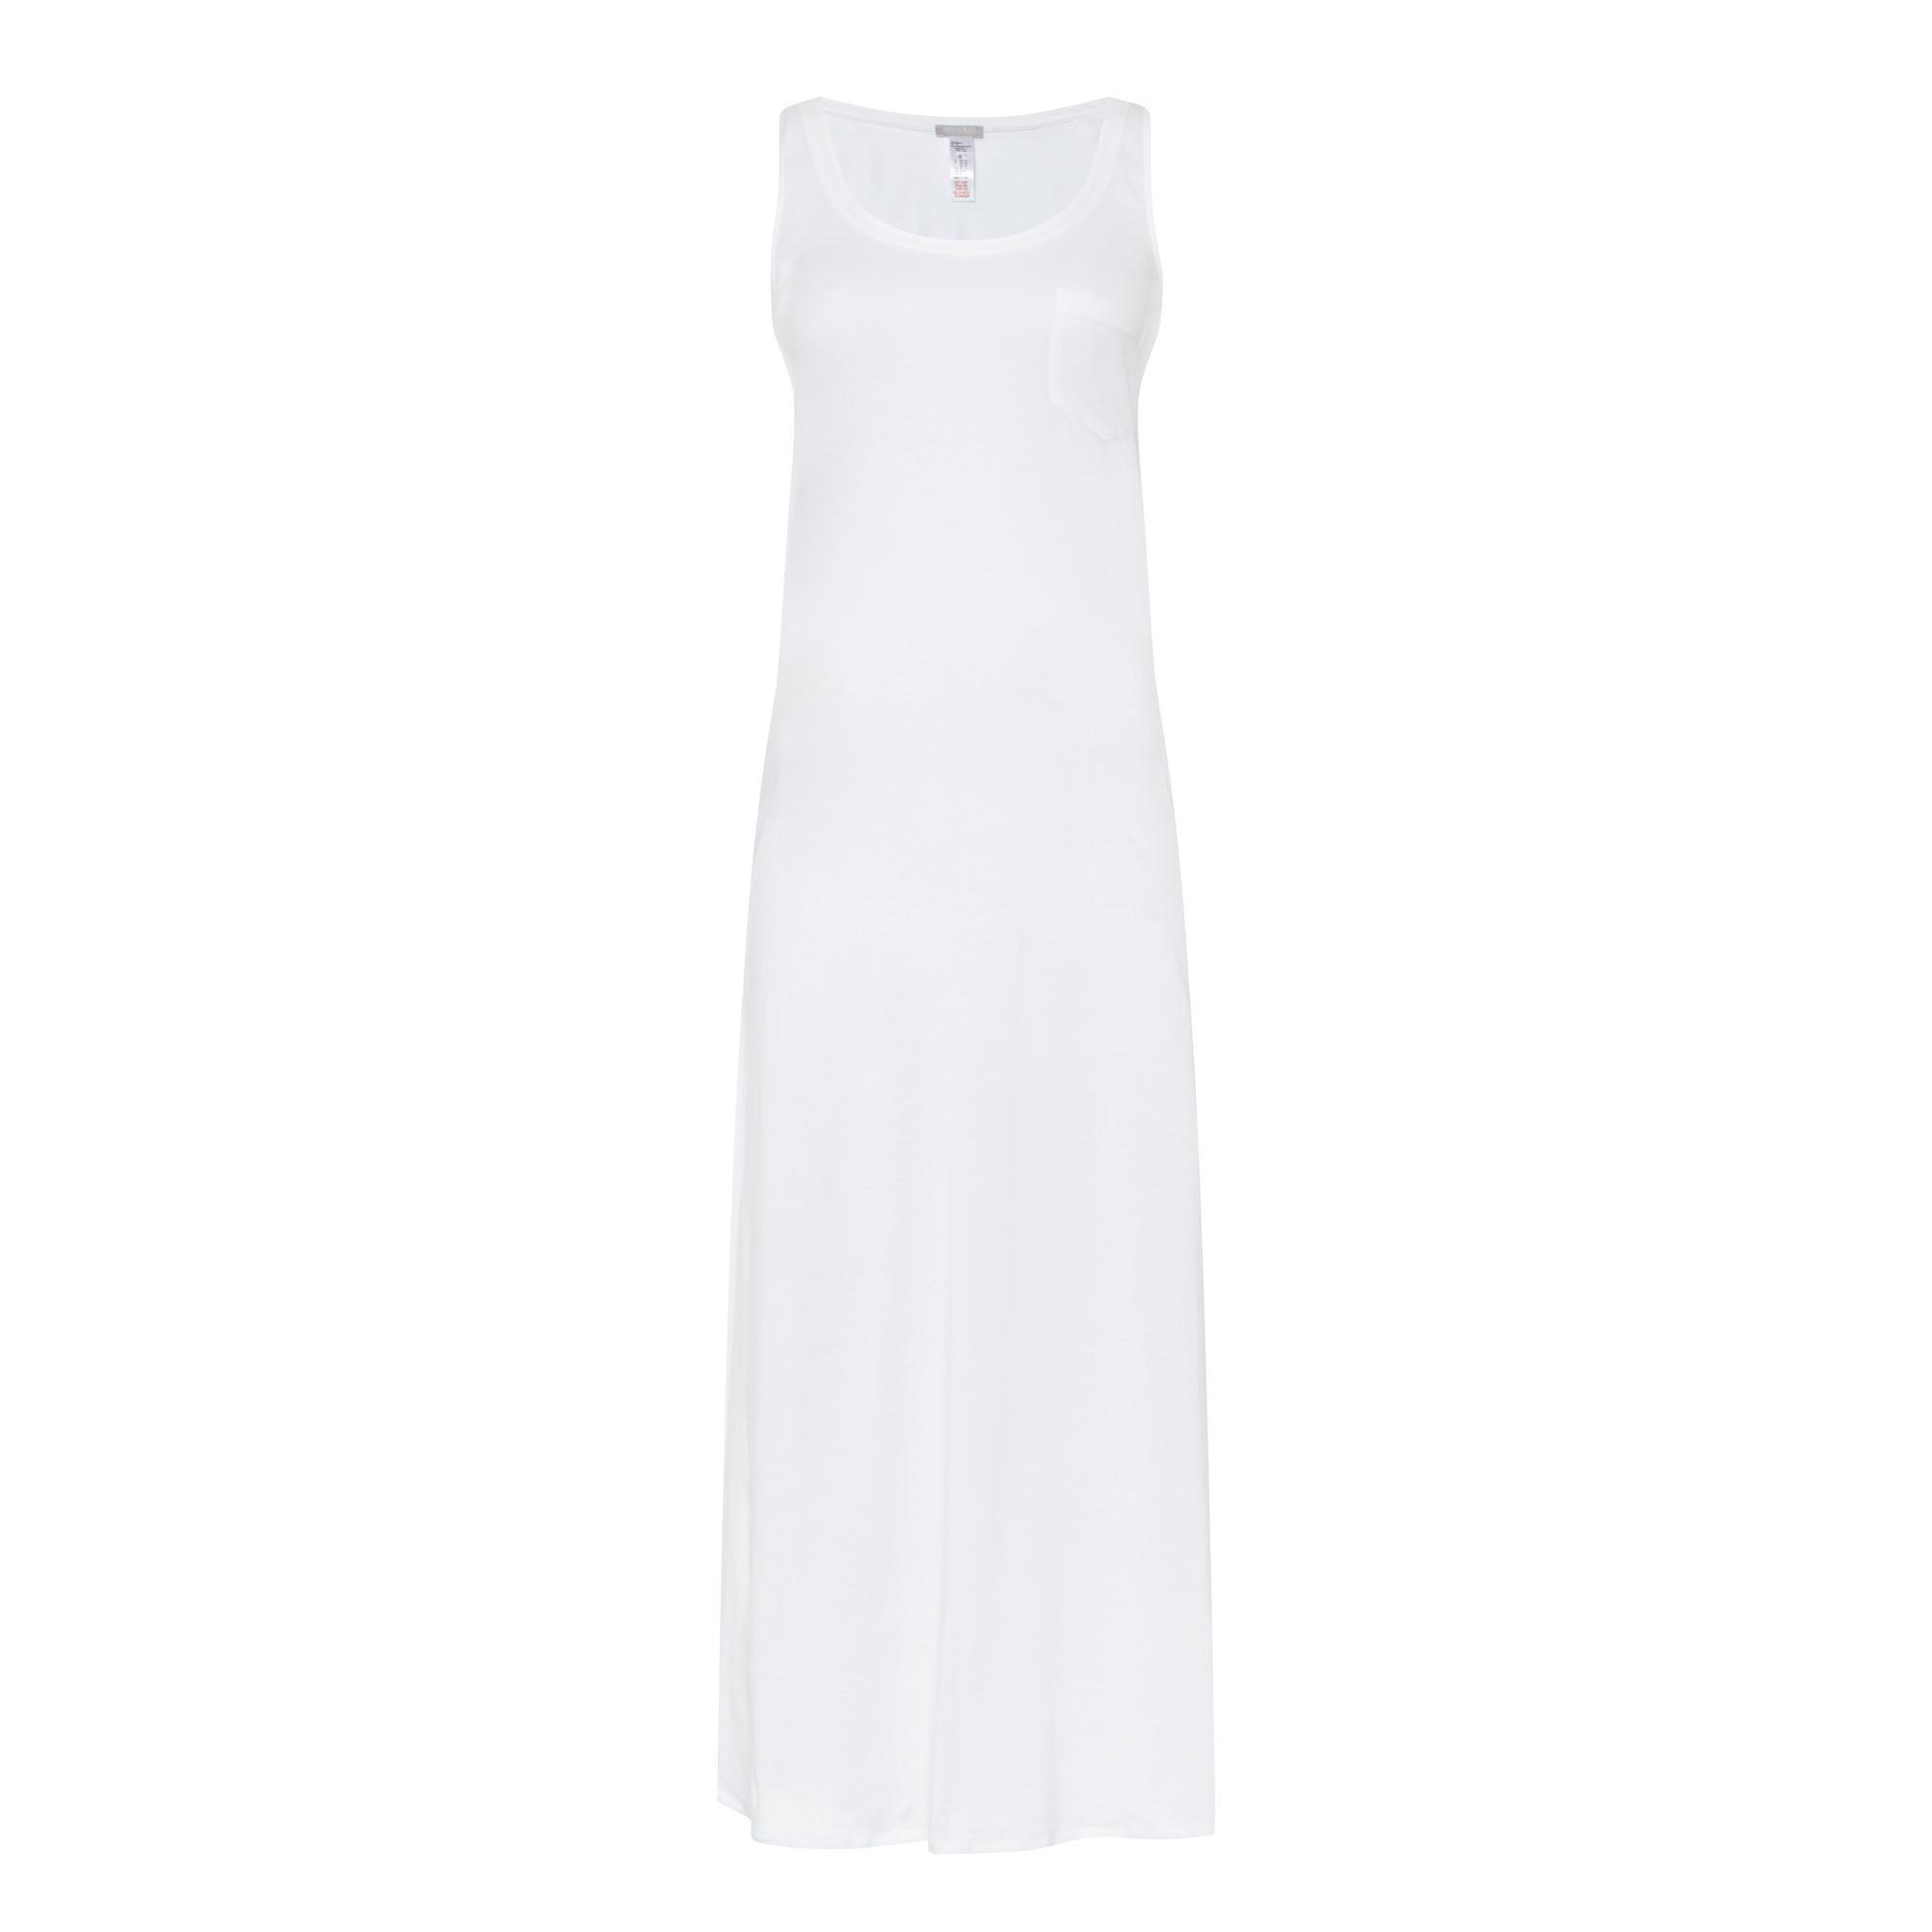 Cotton Deluxe Night Dress